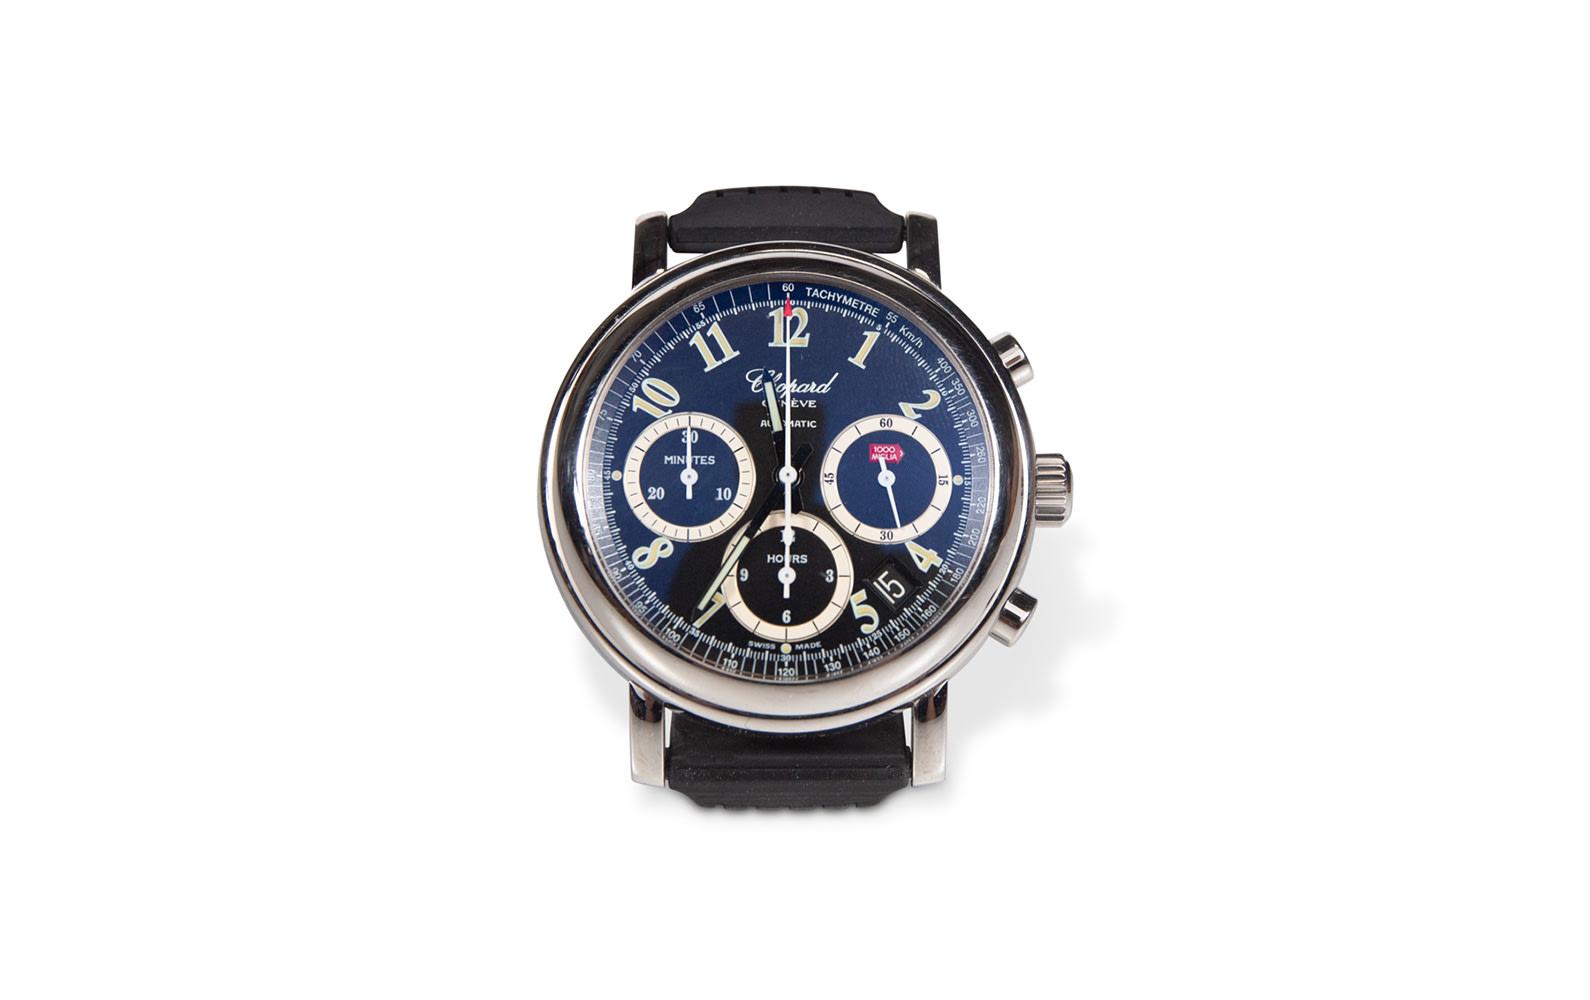 Chopard Mille Miglia Automatic Wrist Watch, Ref.16/8331